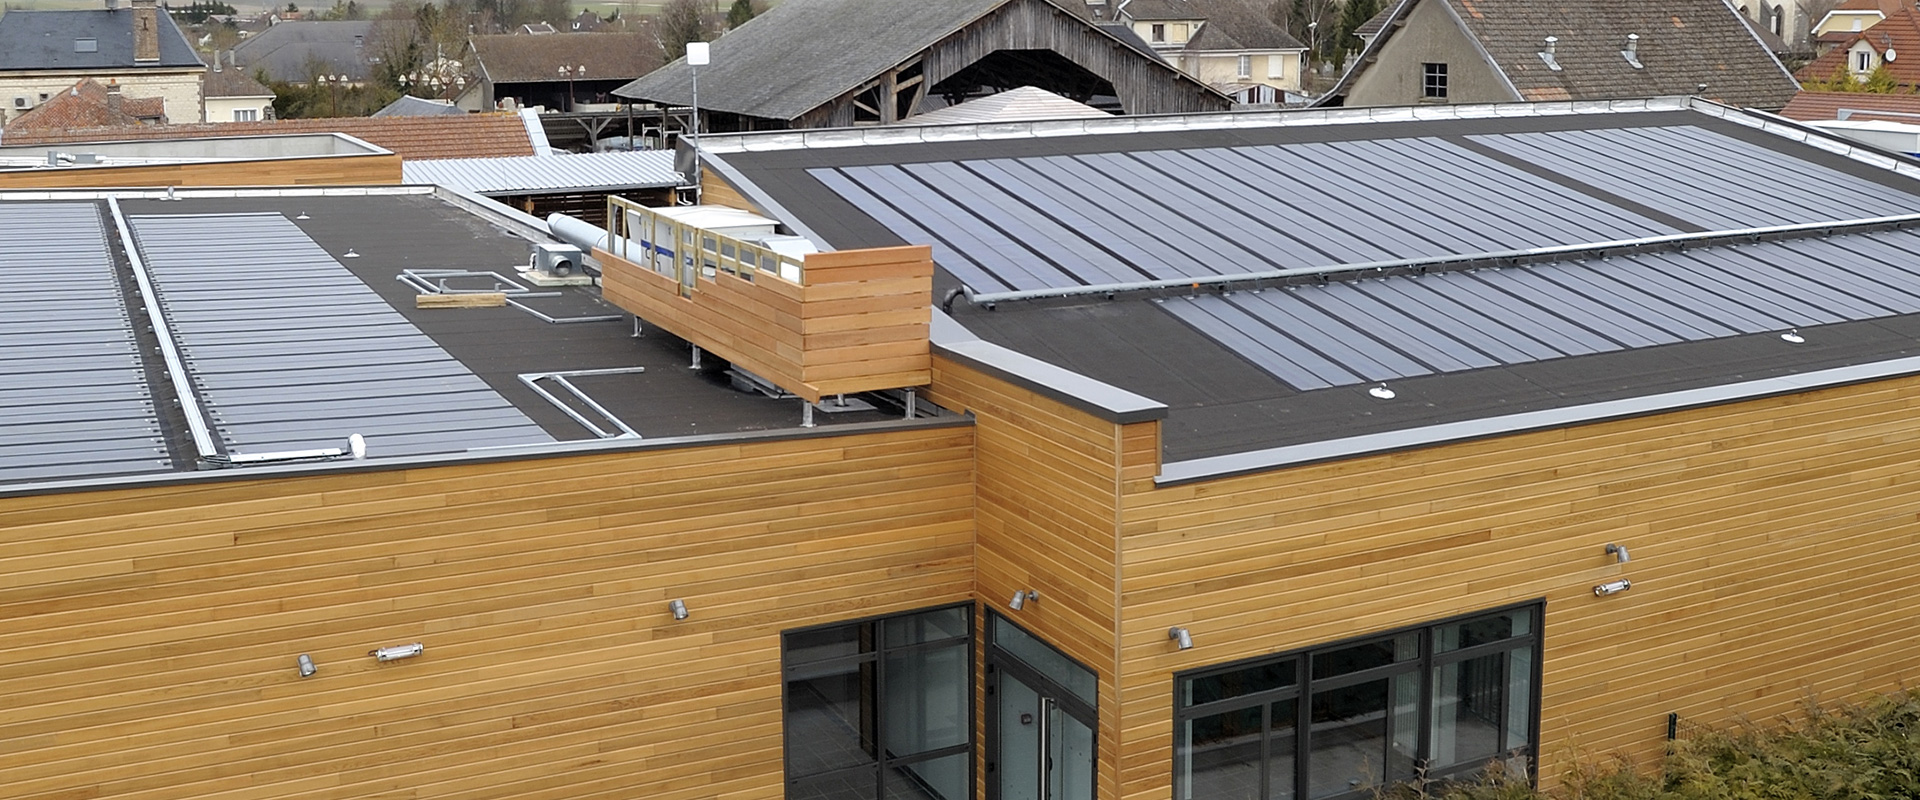 sem-energie-photovoltaique-slider